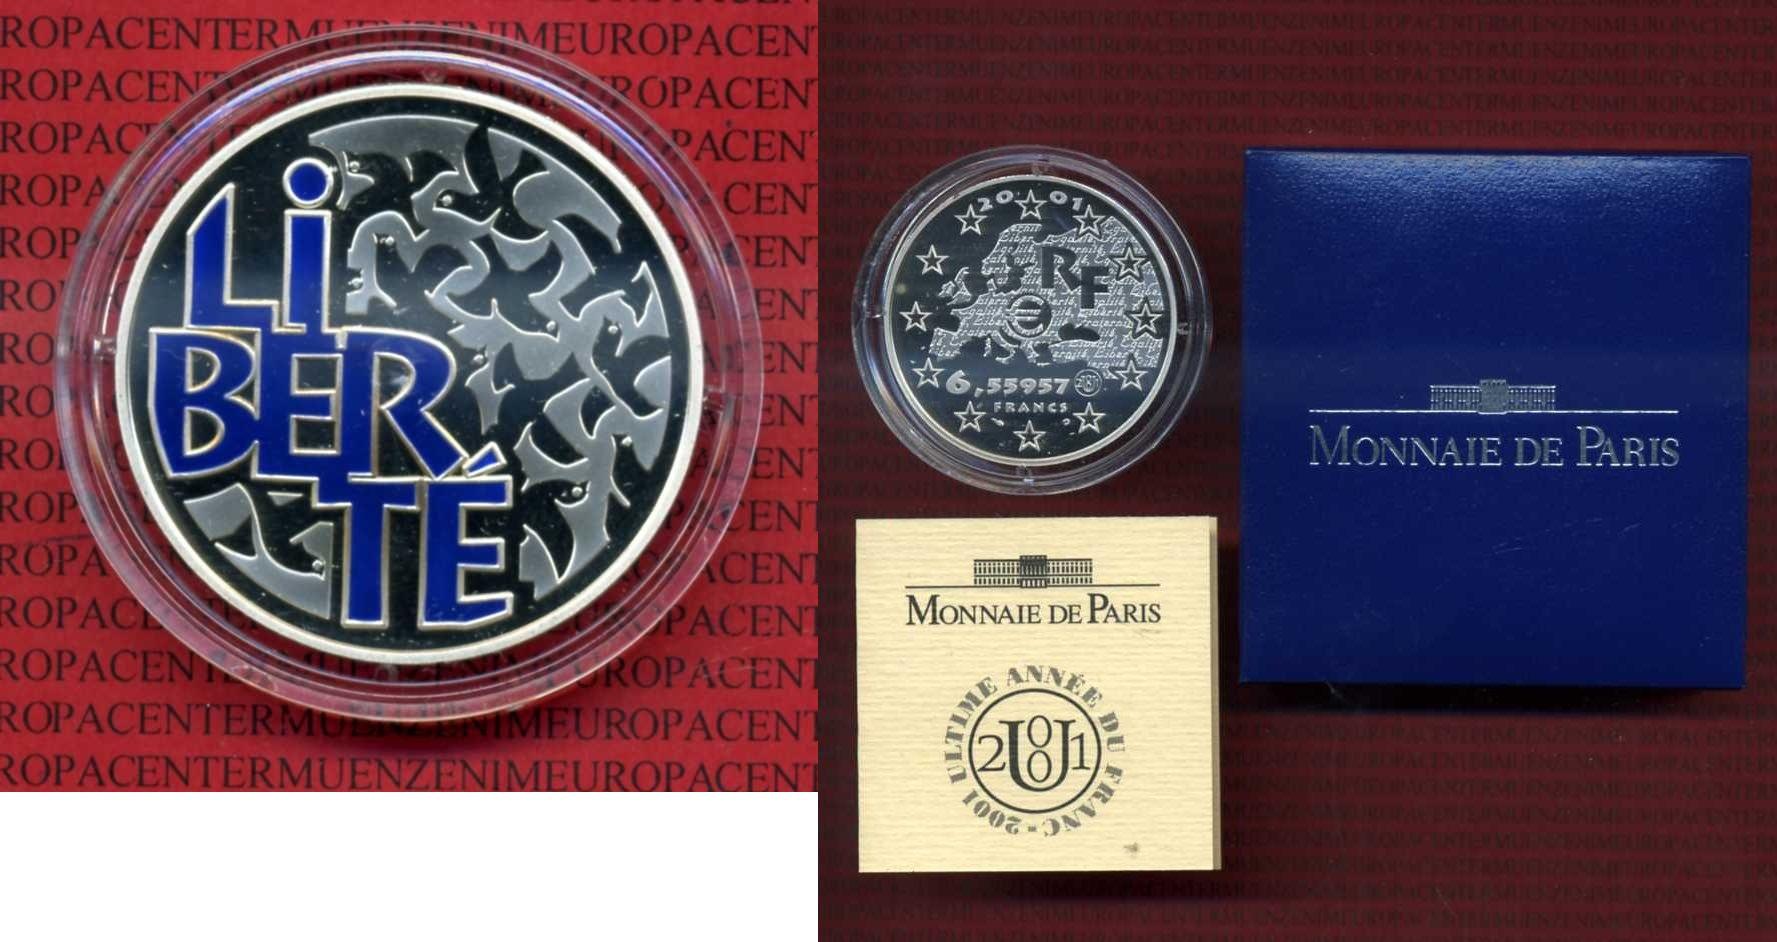 1 Euro Silbermünze, 6,55957 Francs 2001 Frankreich Frankreich 6,5 Francs 2001- Liberte- Box Zertifikat Kapsel Farbmünze proof box coa colorated